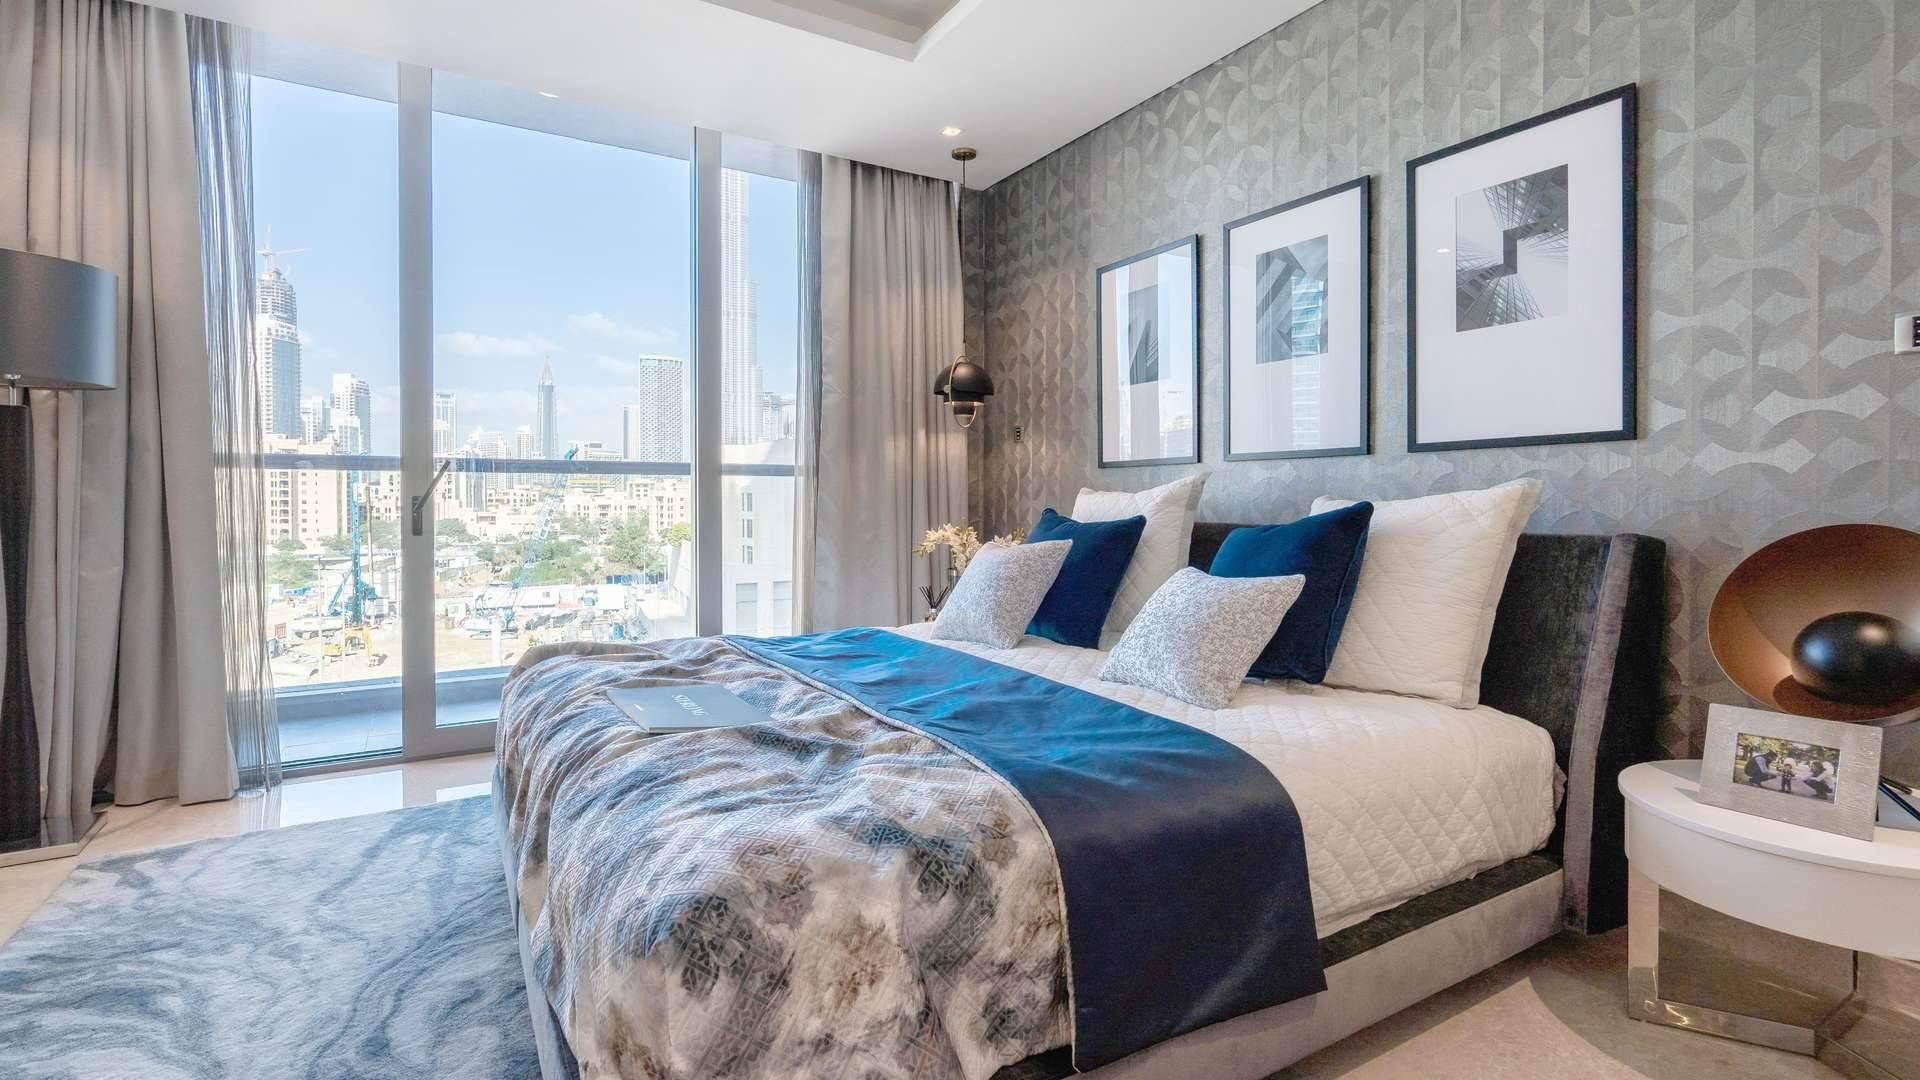 Апартаменты, sale в The Sterling Дубай, ОАЭ